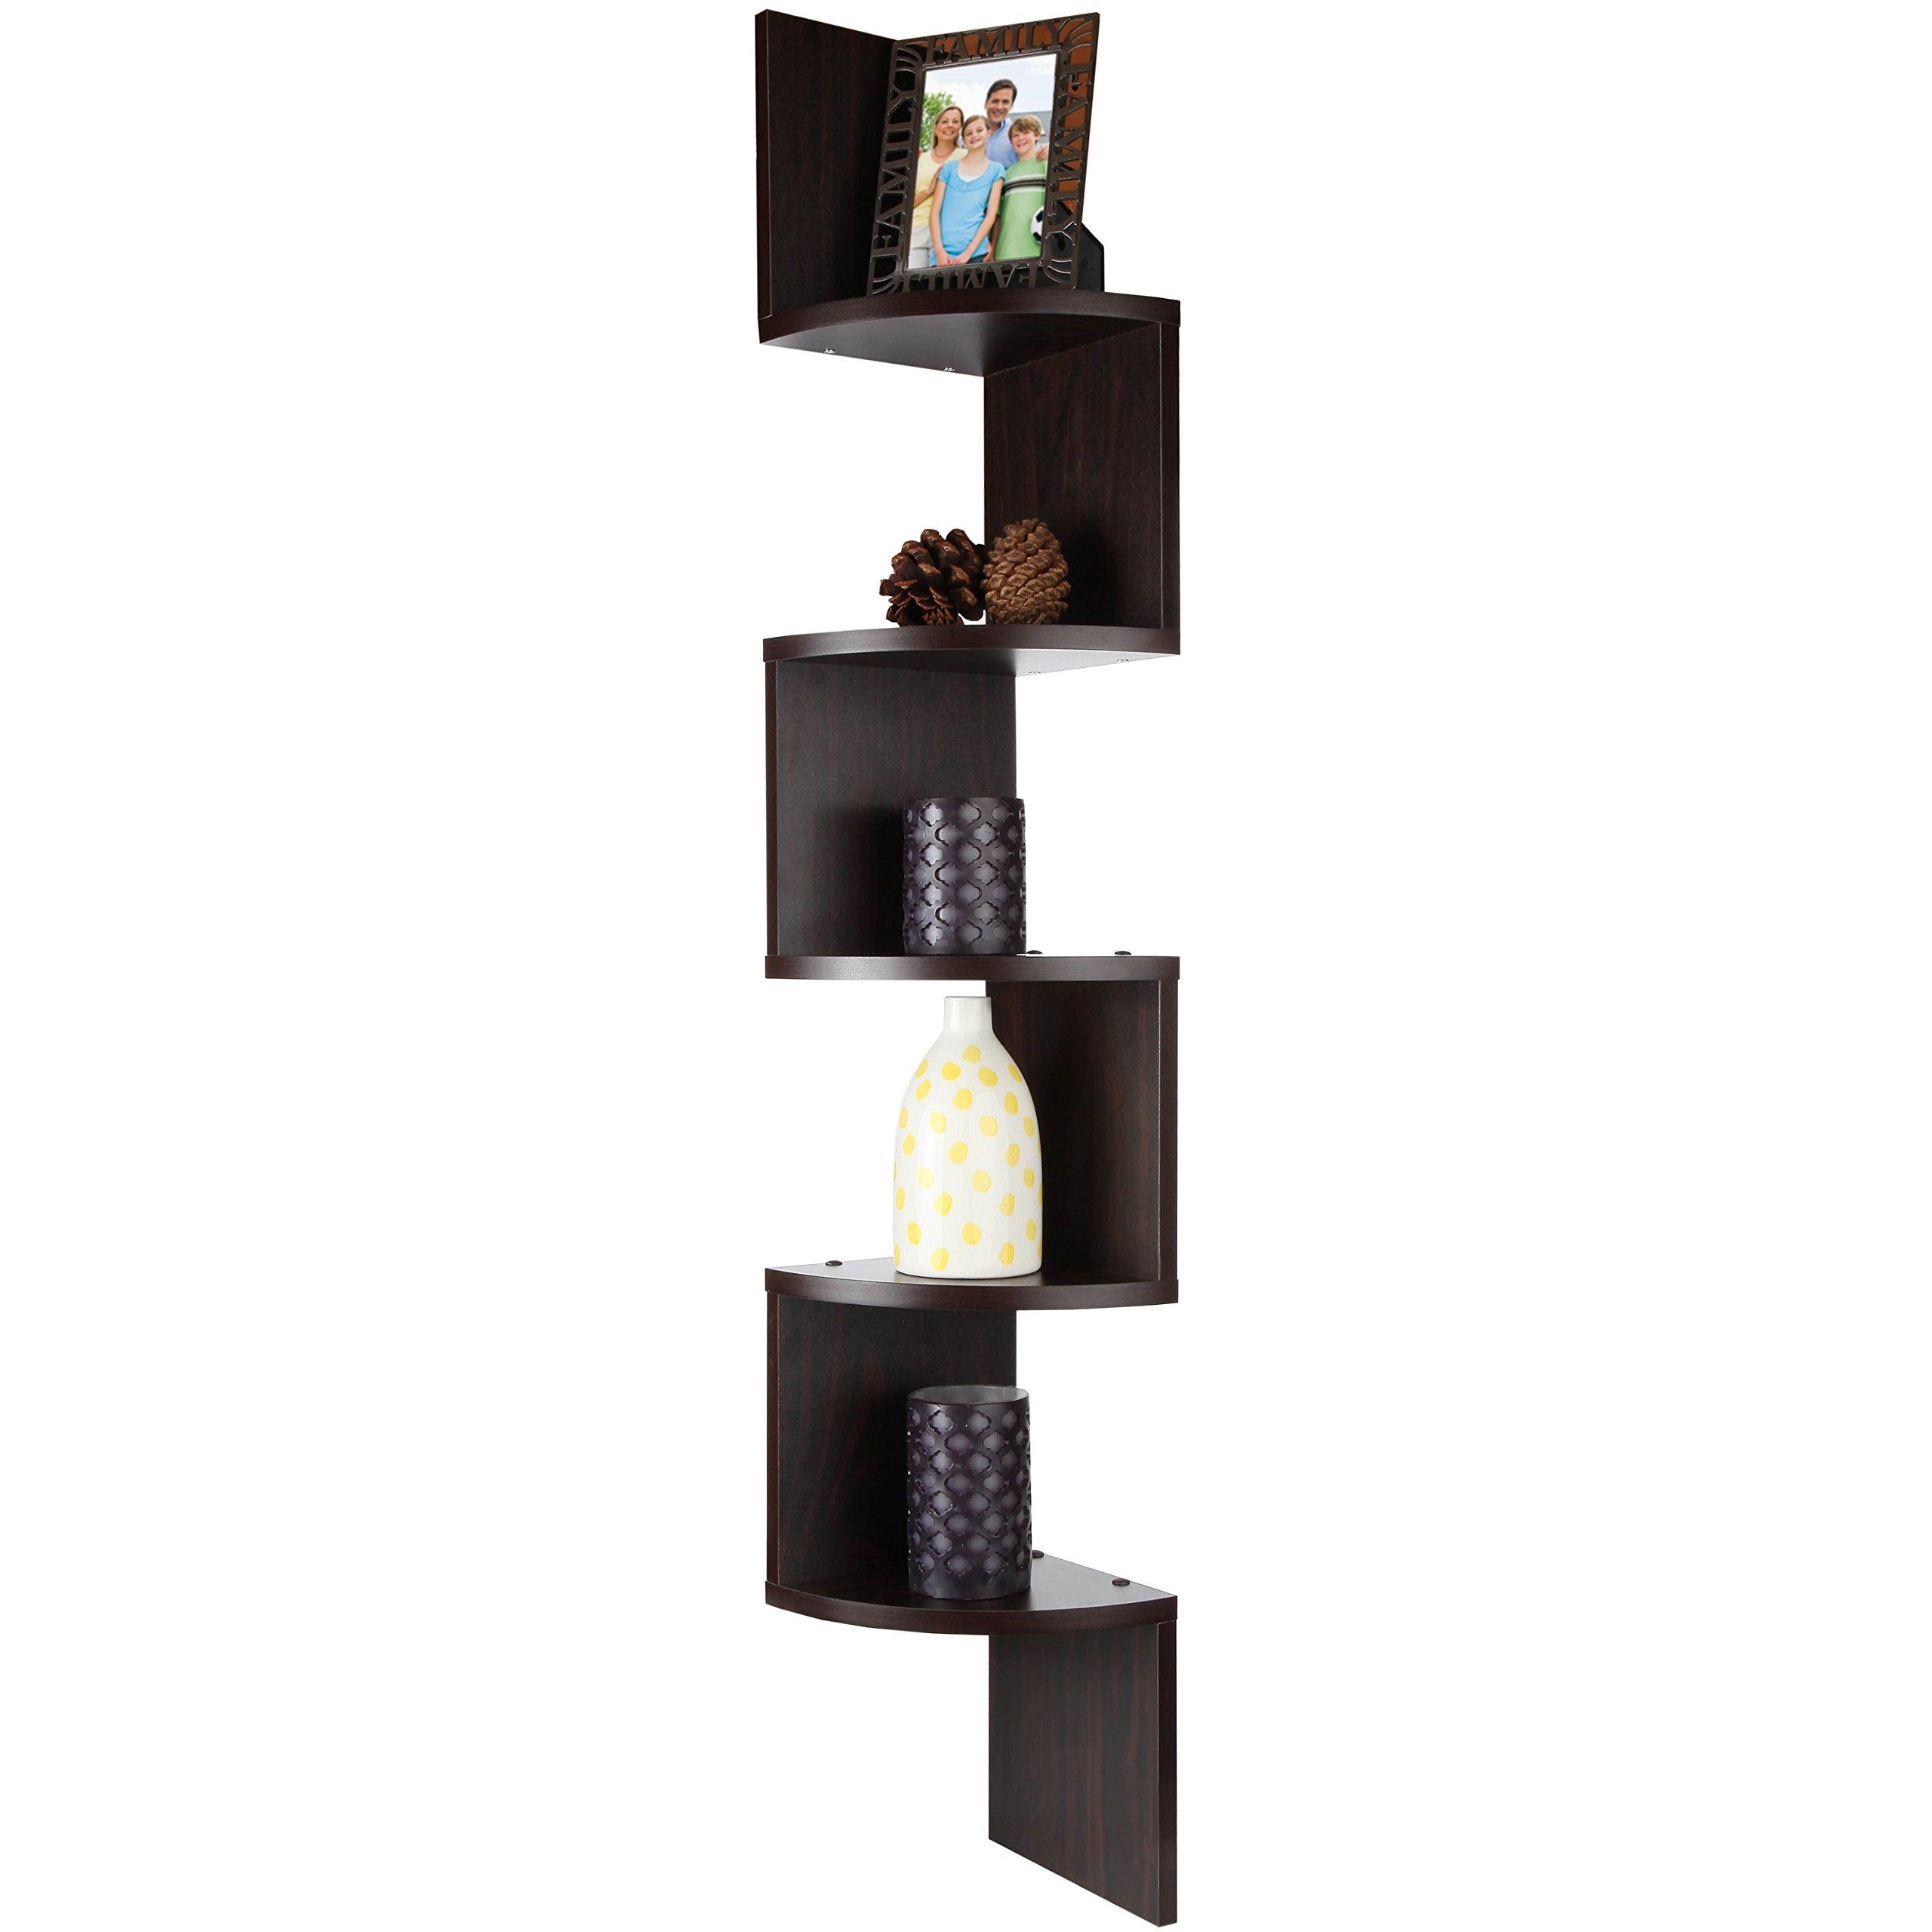 ARAD Floating Shelf, Wall Shelf, Shelf Organizer, Home Decor Shelves, 5 Tiers Walnut Corner Floating Wooden Shelf